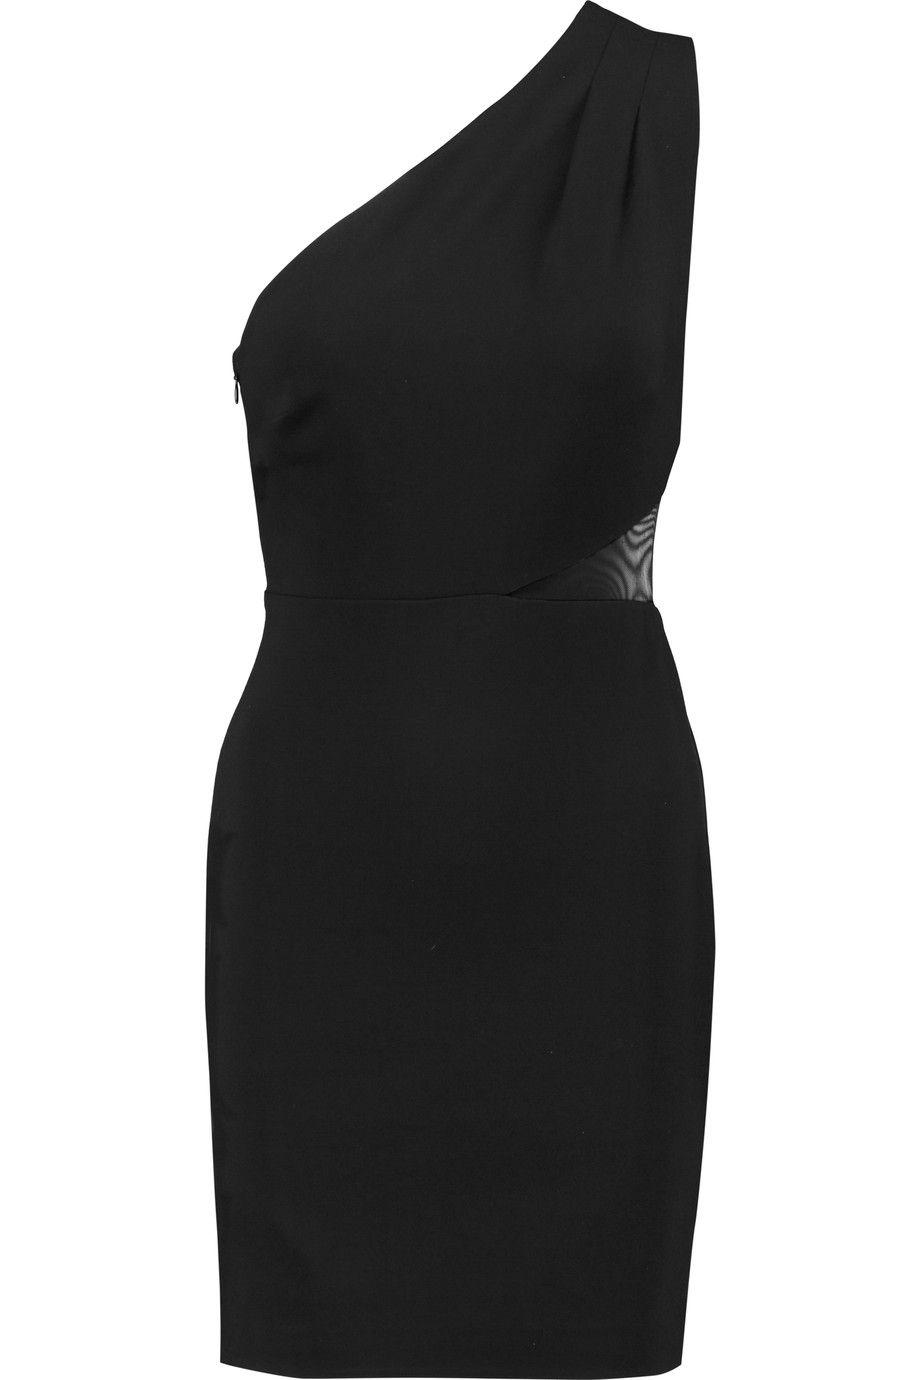 HALSTON HERITAGE One-Shoulder Paneled Ponte Mini Dress. #halstonheritage #cloth #dress